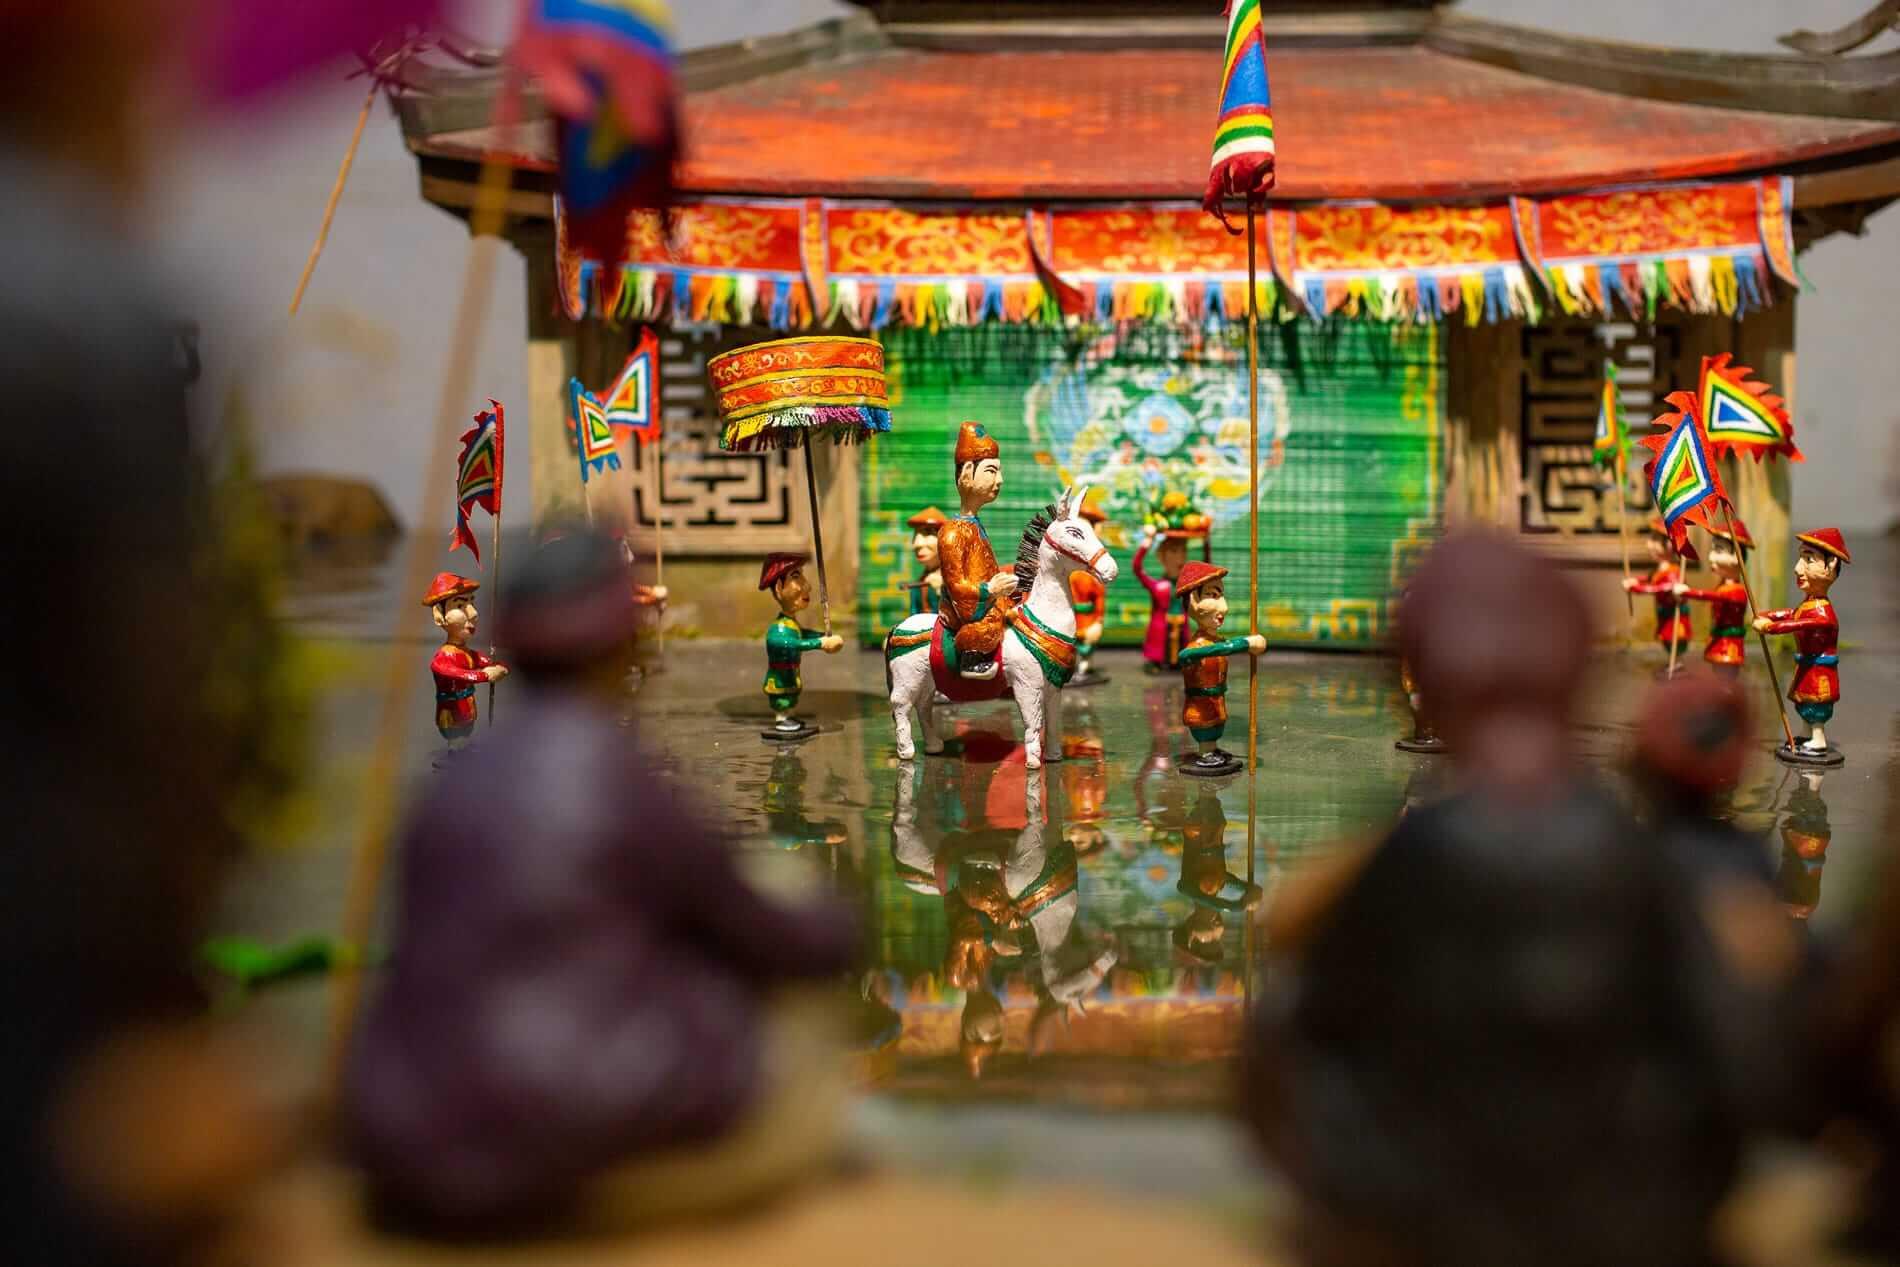 Miniature artwork at Cotic Hoi An